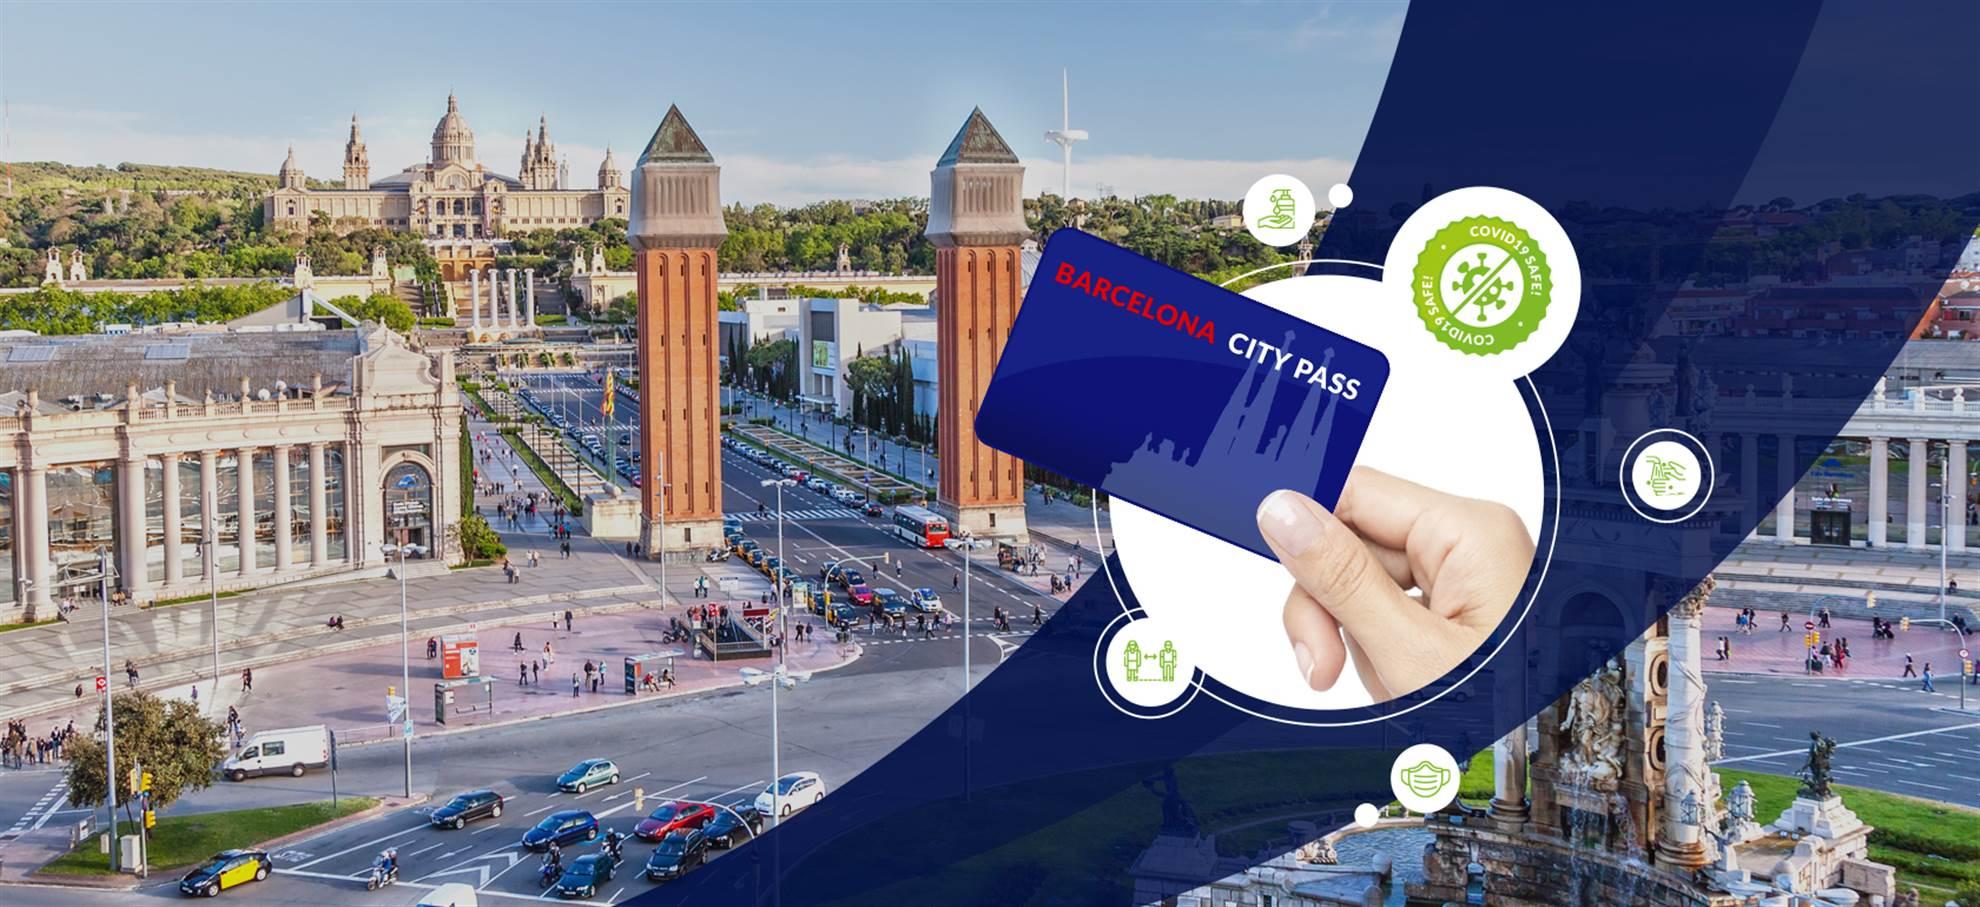 Барселона City Pass (Corona безопасный)